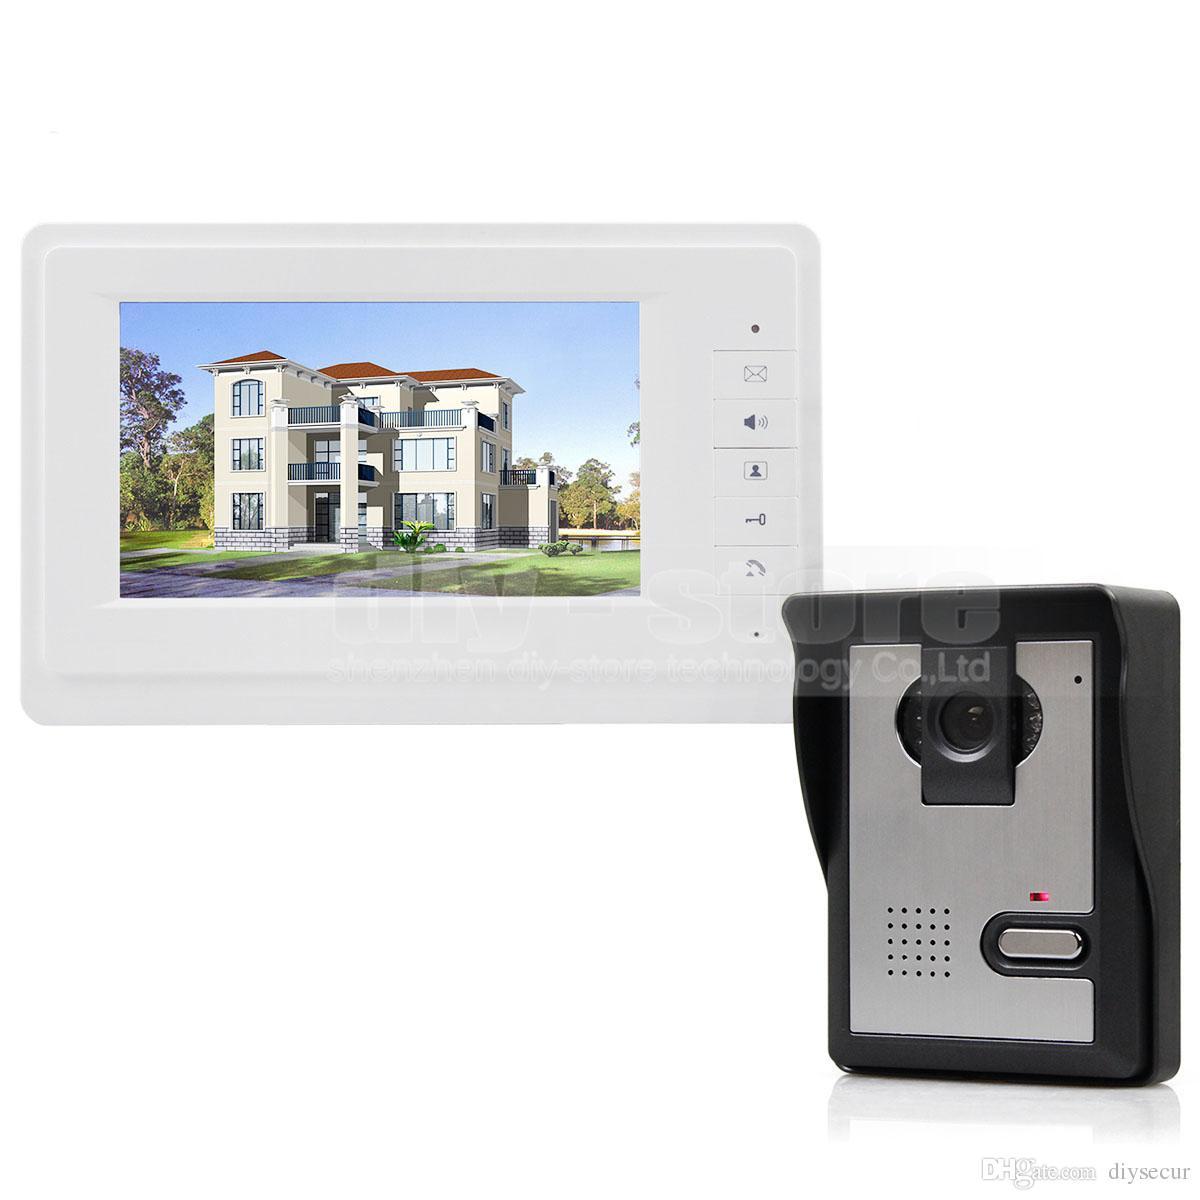 DIYSECUR Video Door Phone Intercom 600TVLine HD CCD Camera High Quality 7 inch TFT Color LCD Display Doorbell Night Vision V70F-L